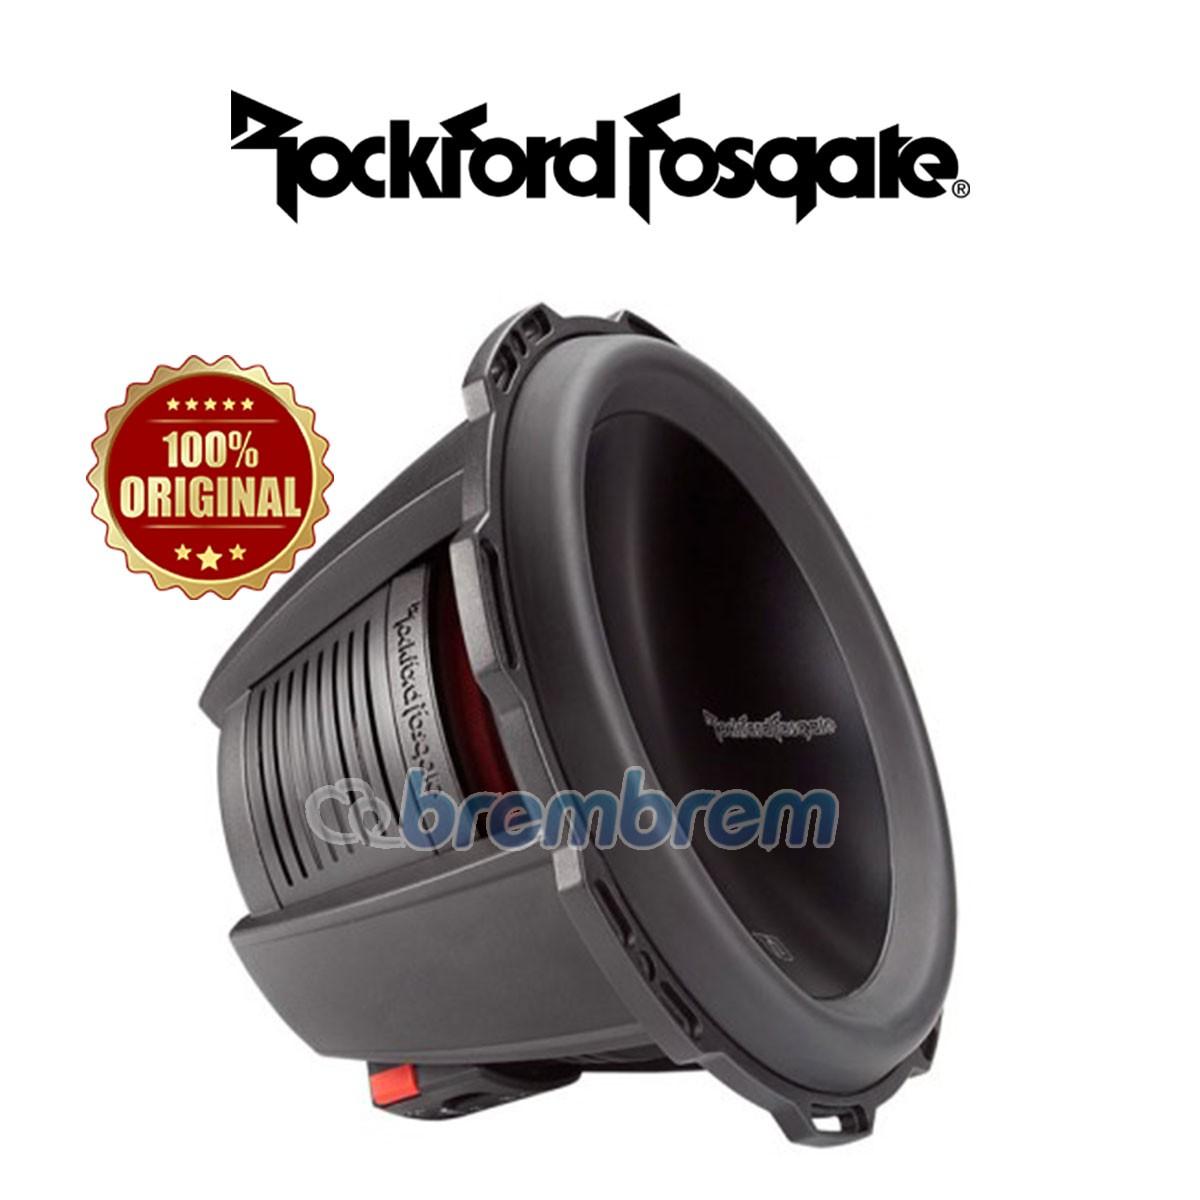 ROCKFORD FOSGATE T0D2-12 - SUBWOOFER PASIF